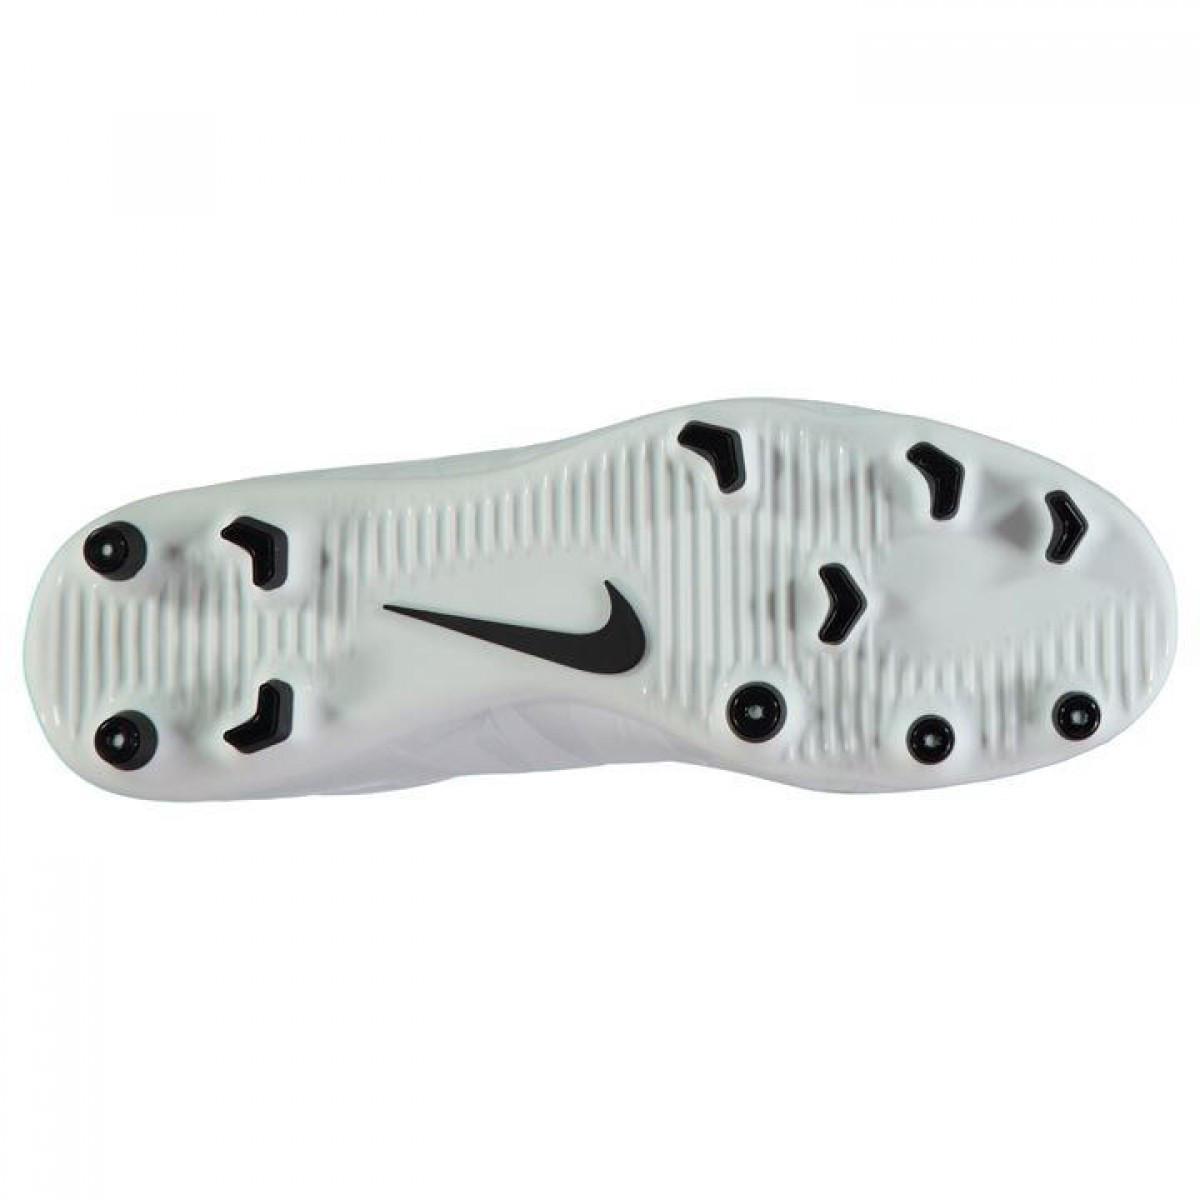 6e18b532 Бутсы Nike Mercurial Vortex CR7 FG Football Blue/Black - Оригинал, ...